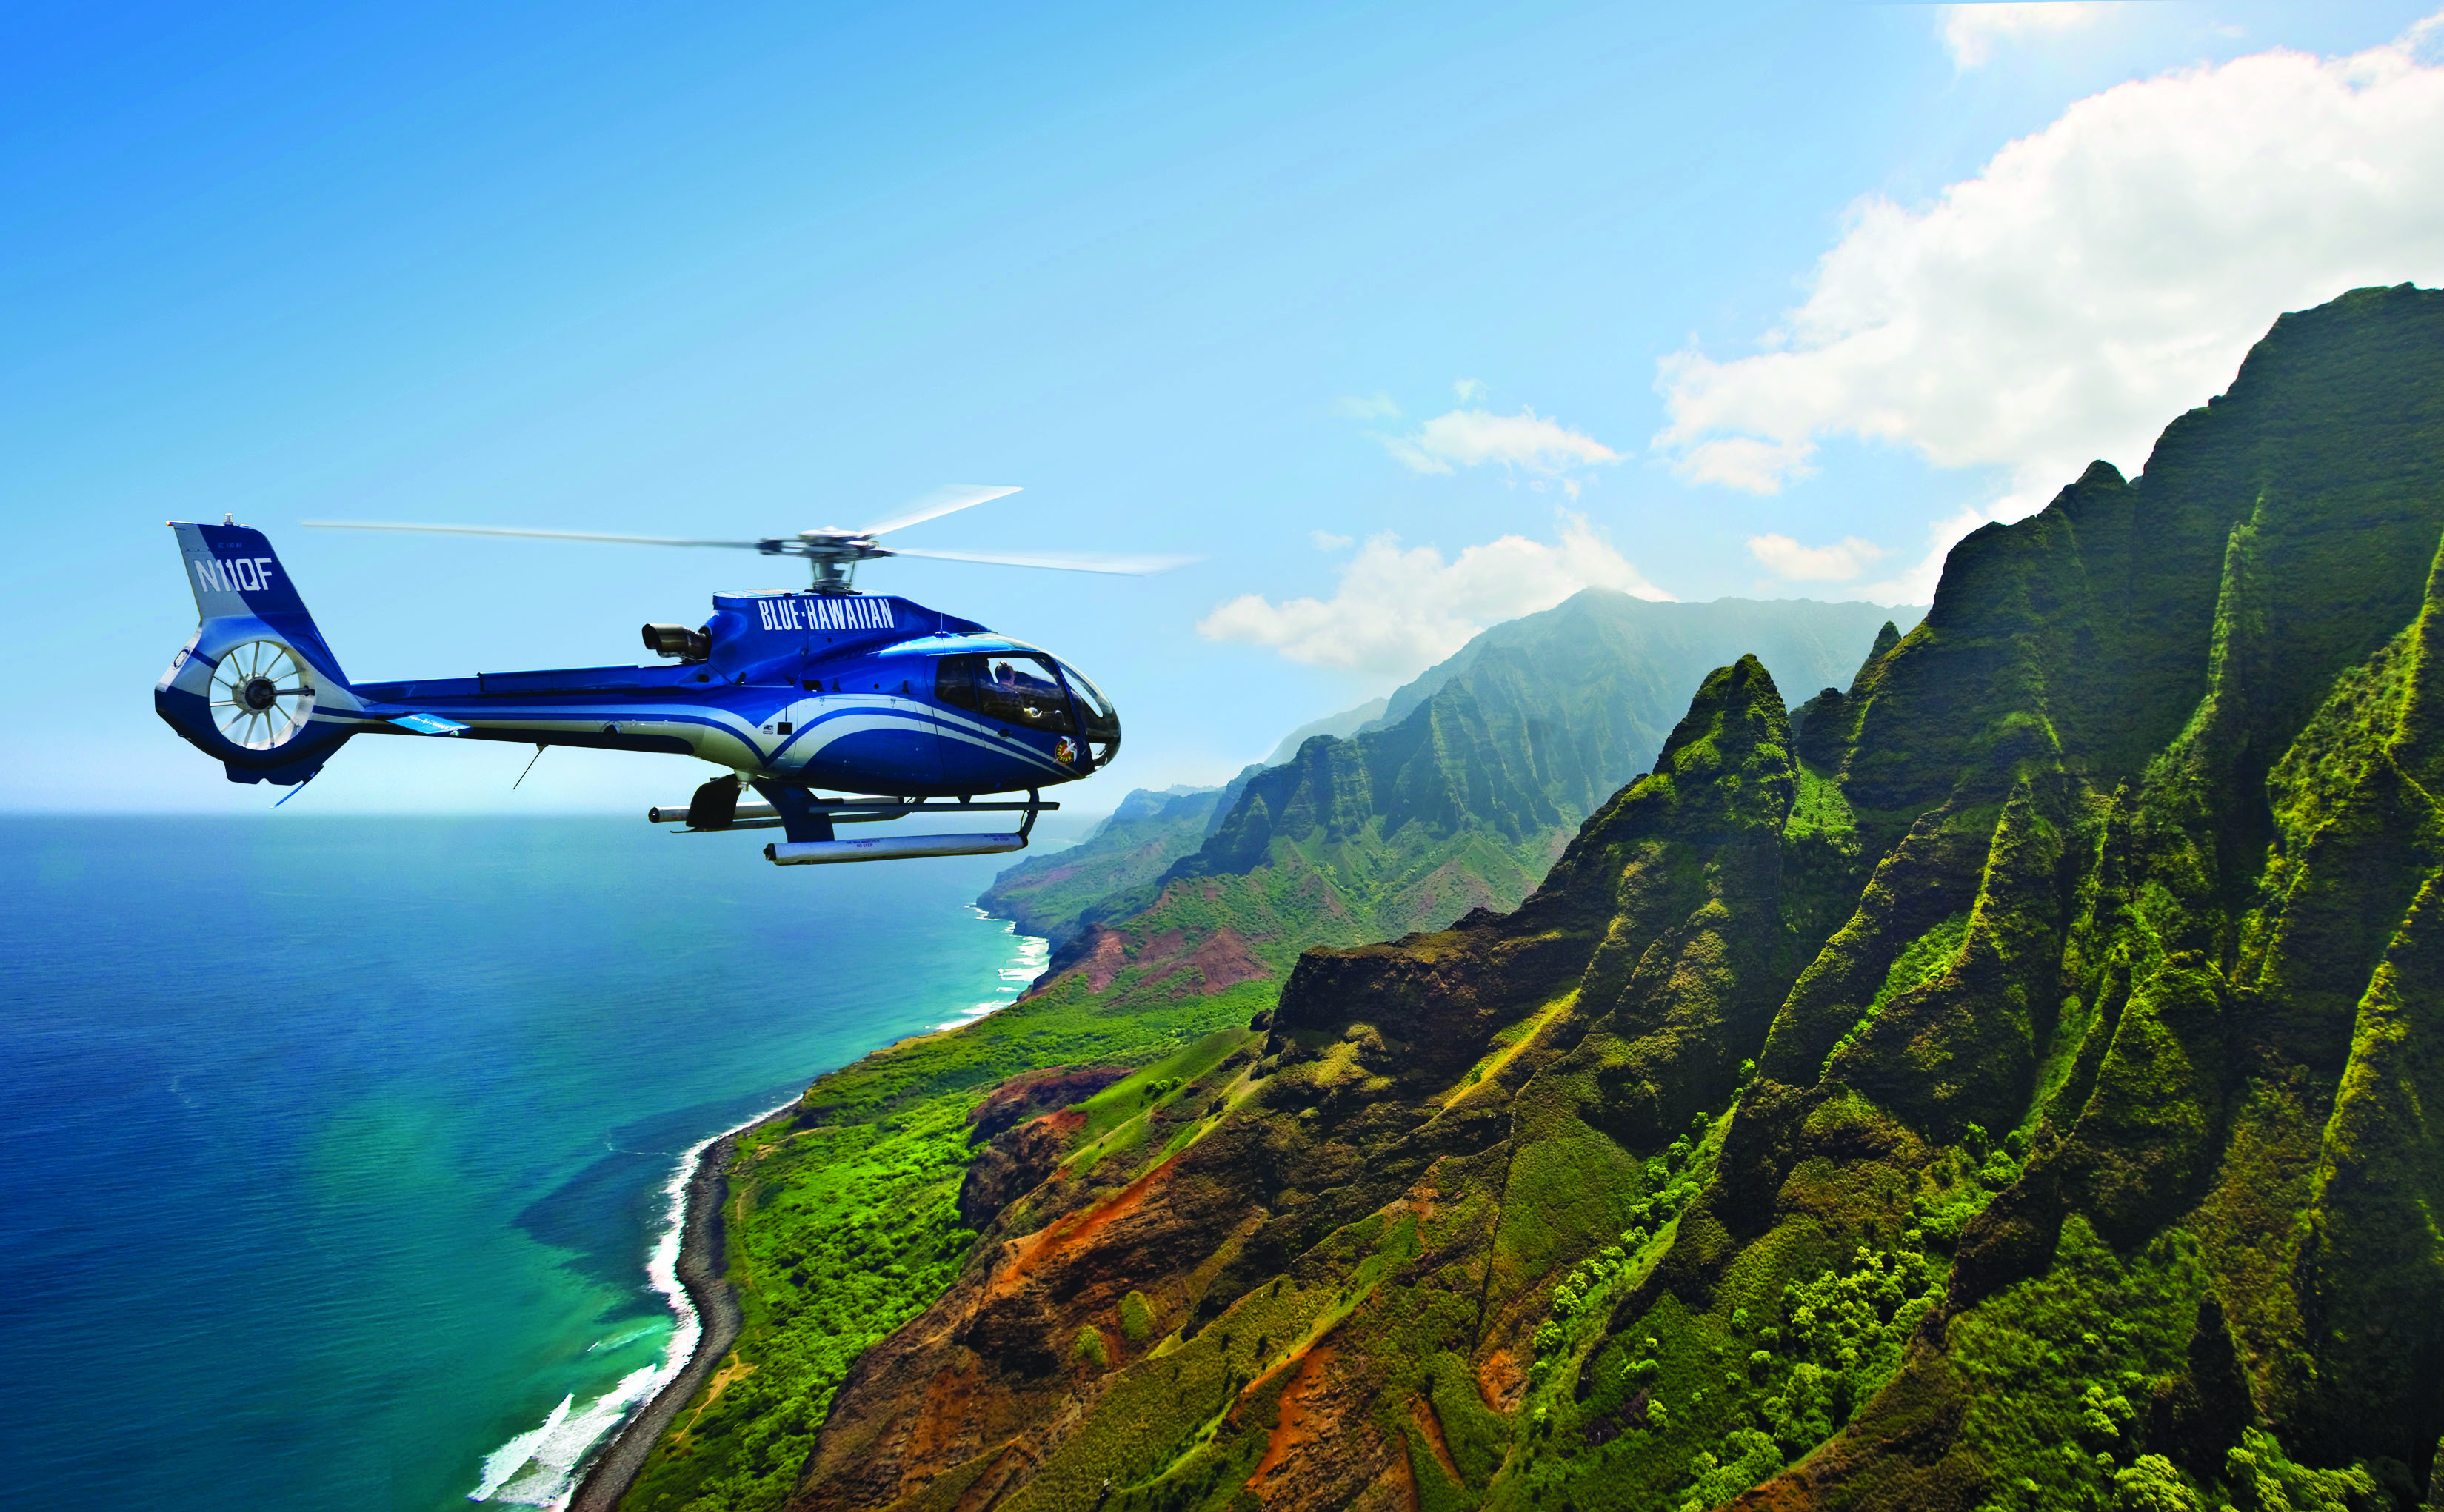 Aerial tour of the Big Island Hawaii